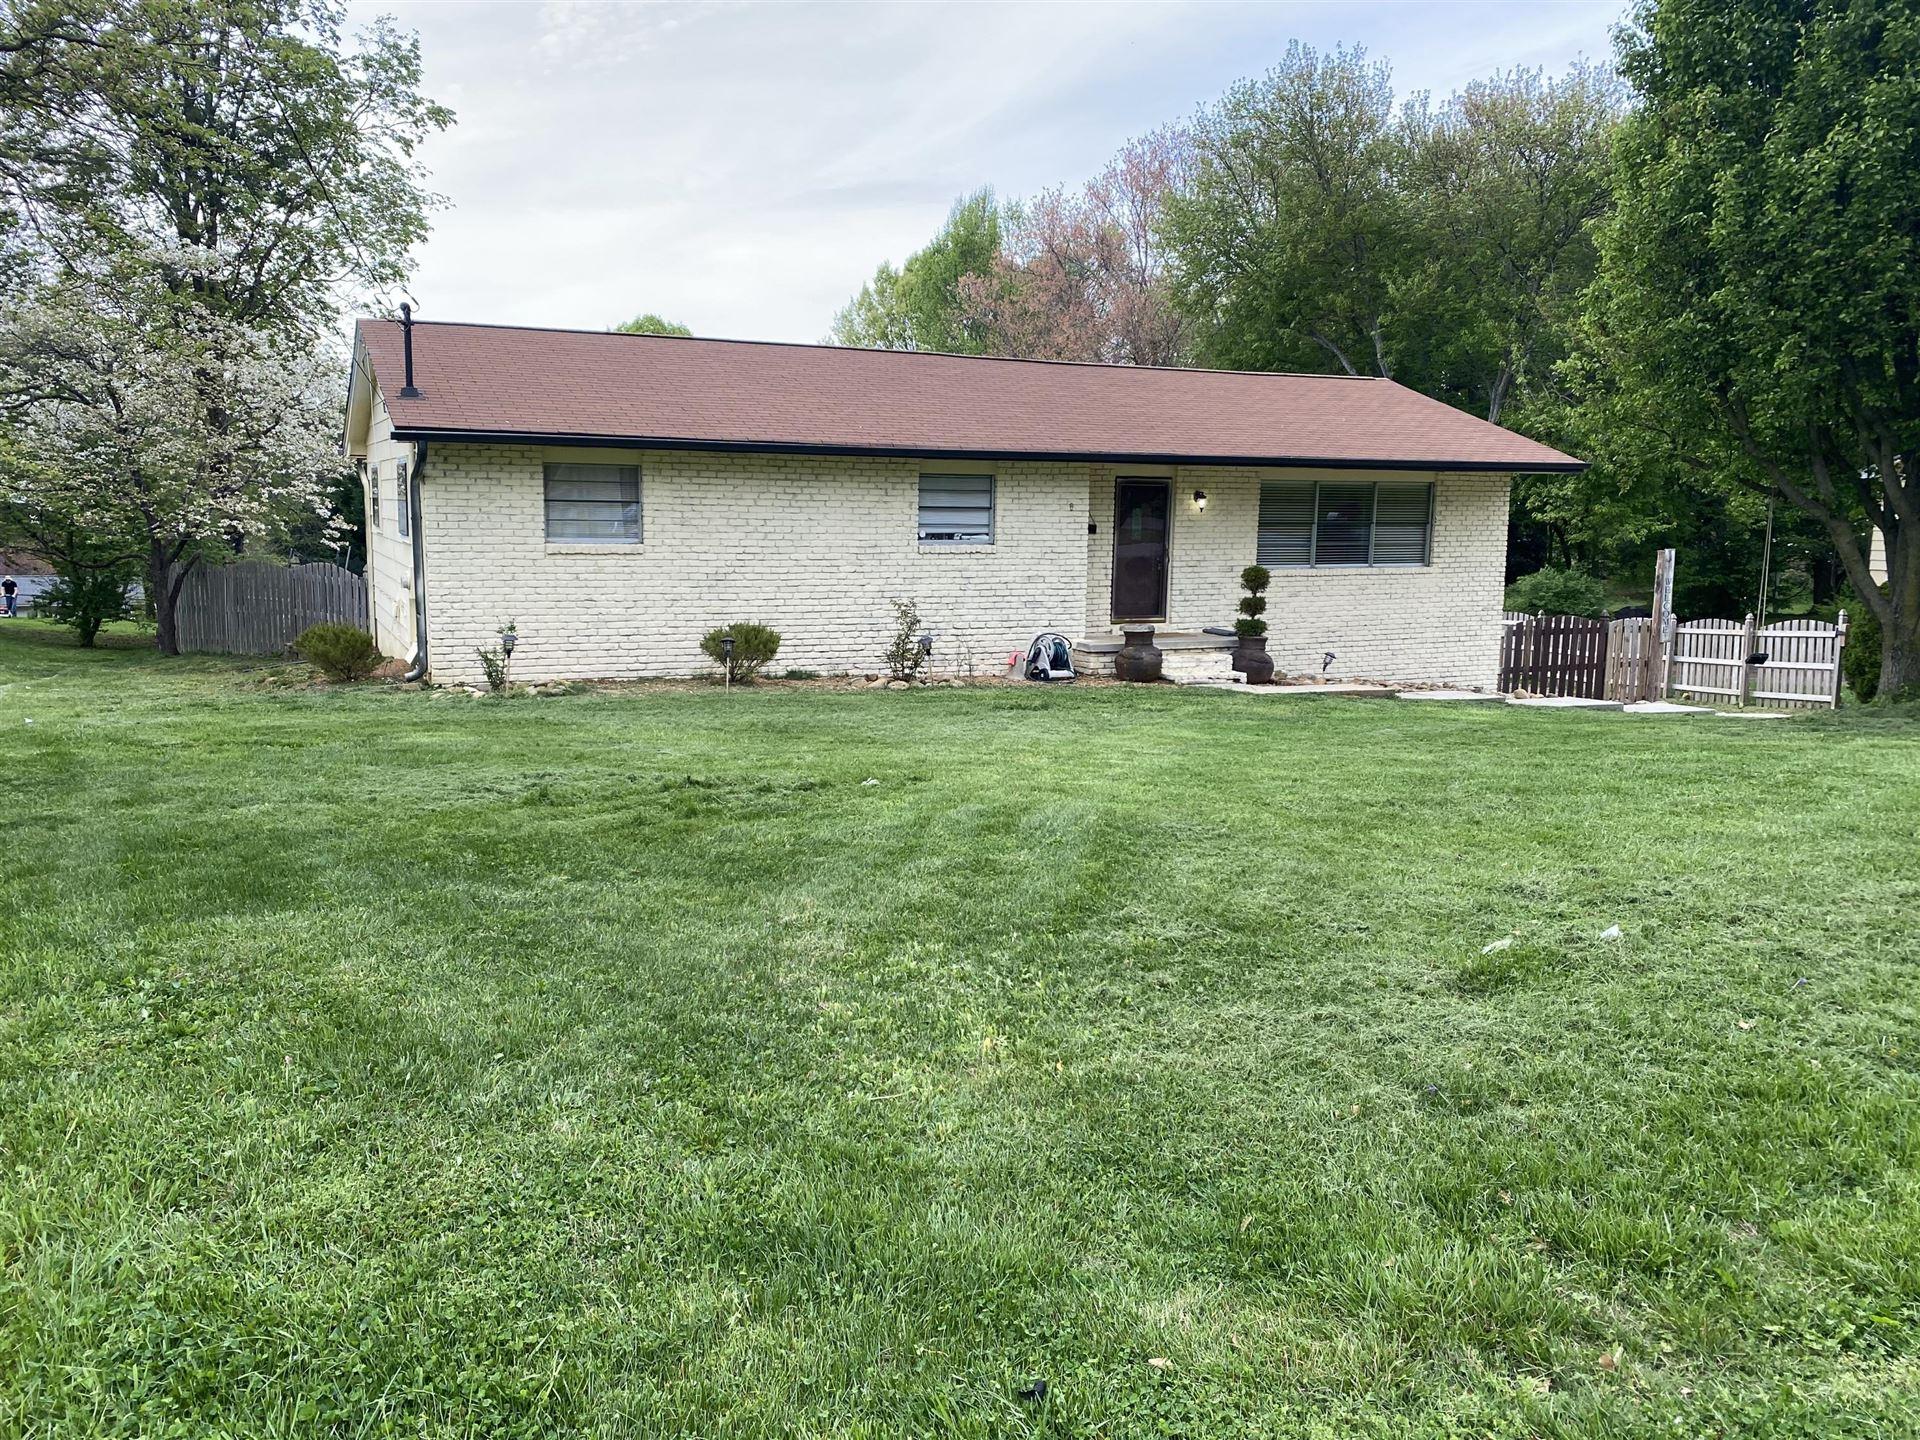 Photo of 11037 Hughlan Drive, Knoxville, TN 37934 (MLS # 1149517)